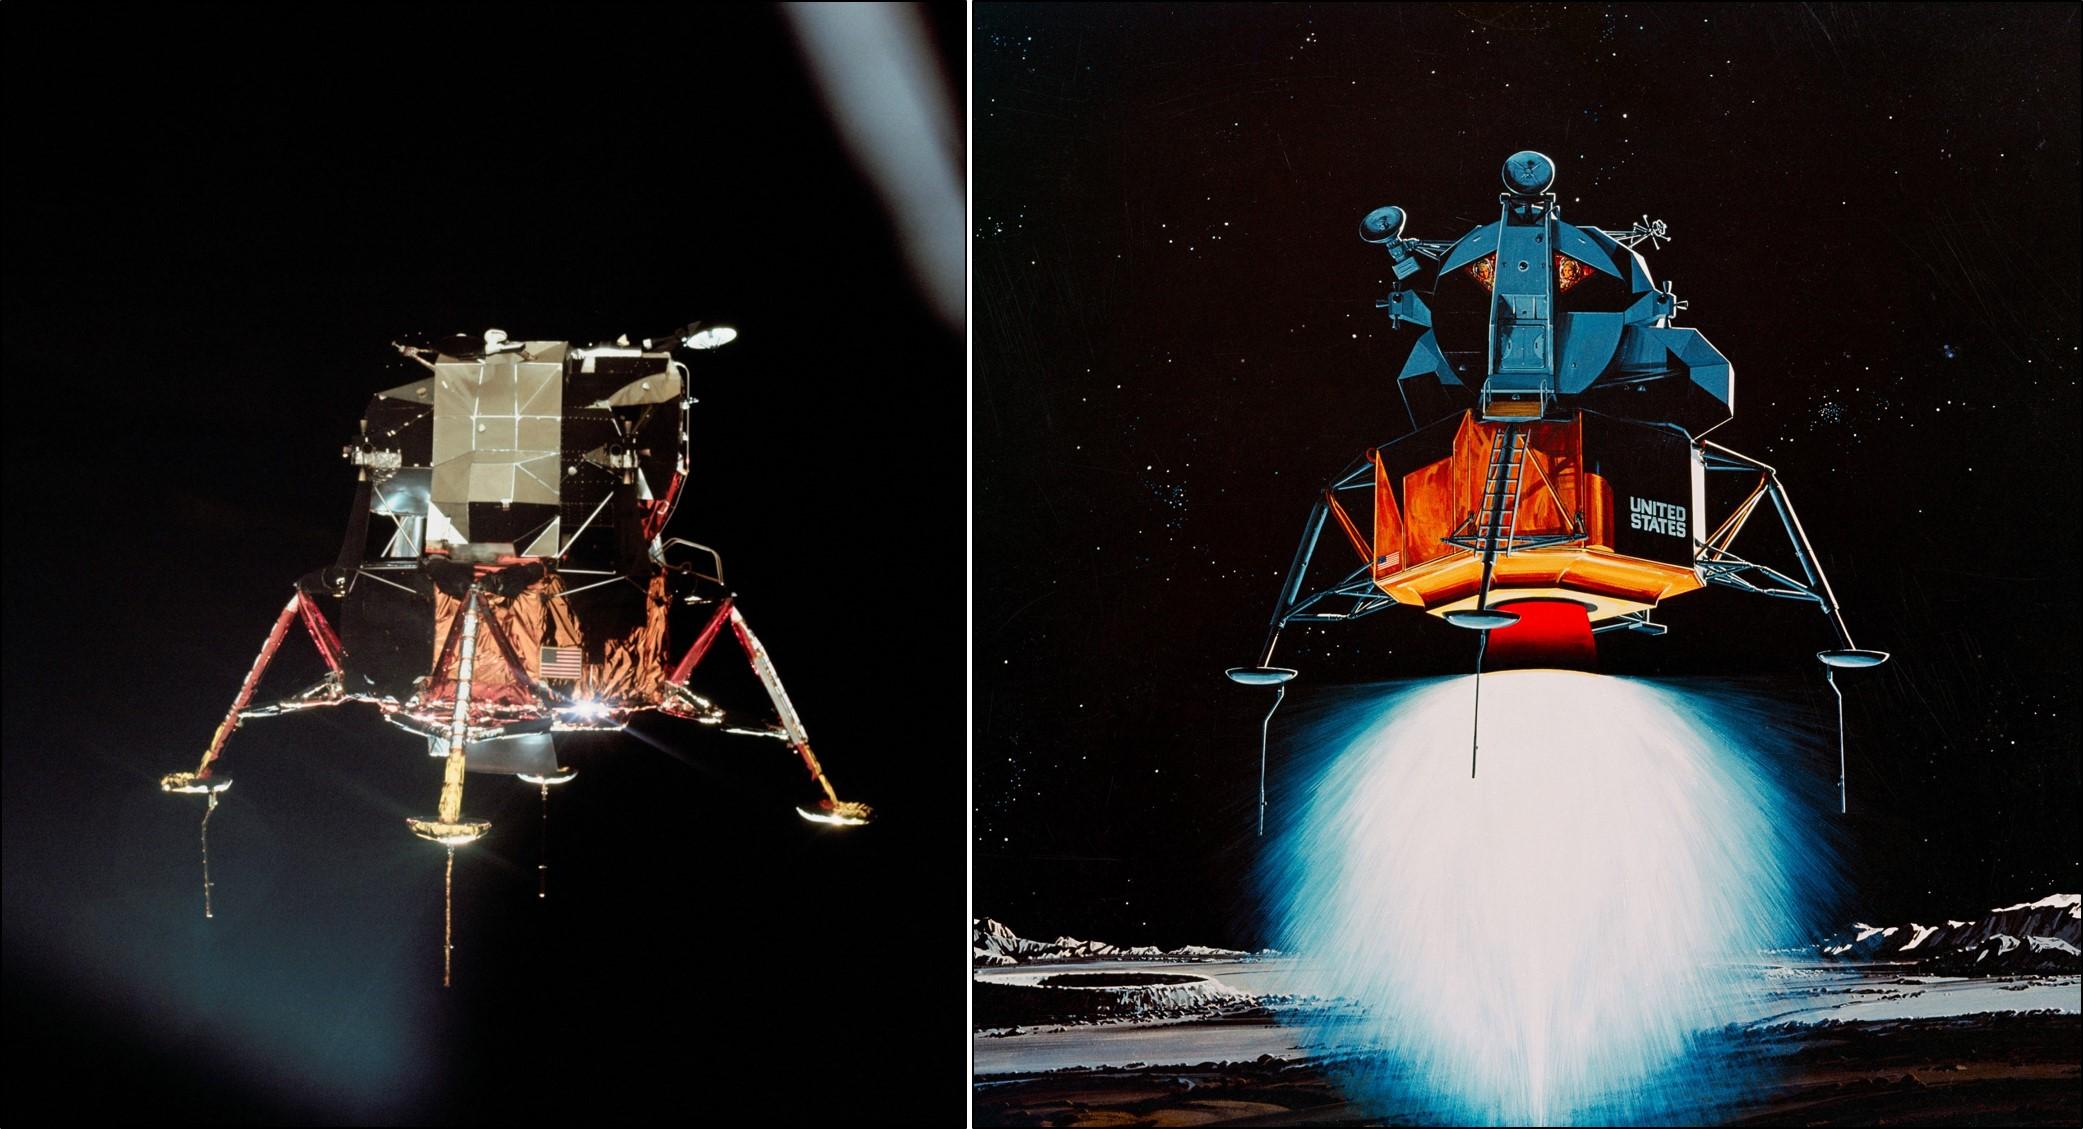 Apollo 11's lunar module lands on the Moon